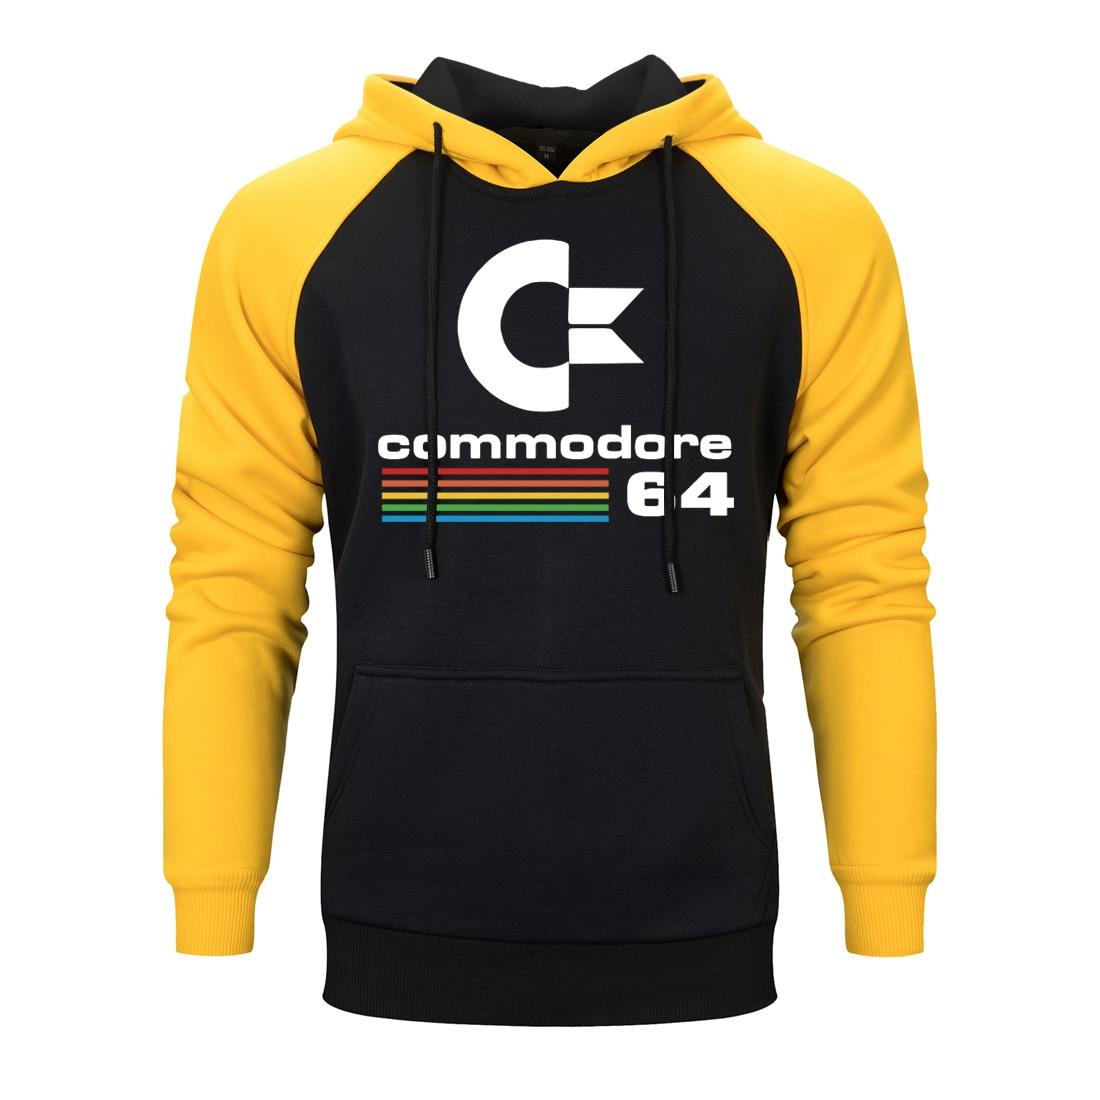 Men 2020 spring autumn Hip Hop Hoody Streetwear Sweatshirts Commodore 64 Raglan Harajuku Hoodies For Warm Clothing Fashion Tops